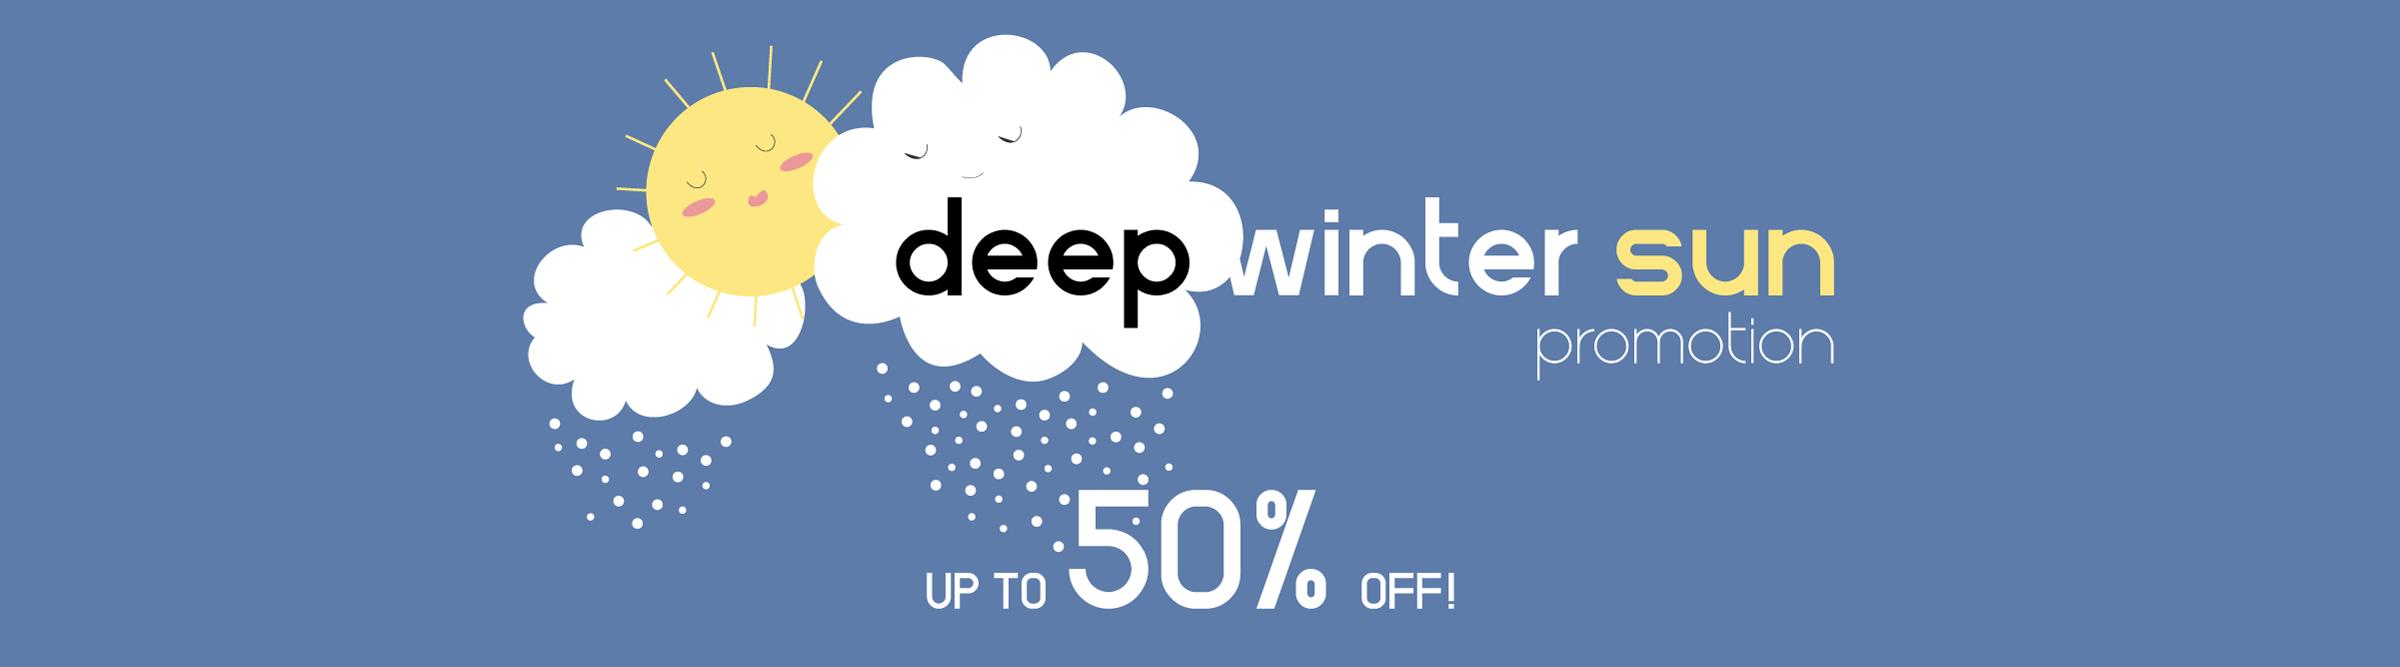 Deep Winter Sun Promotion Insight Eye Care on Sunglasses